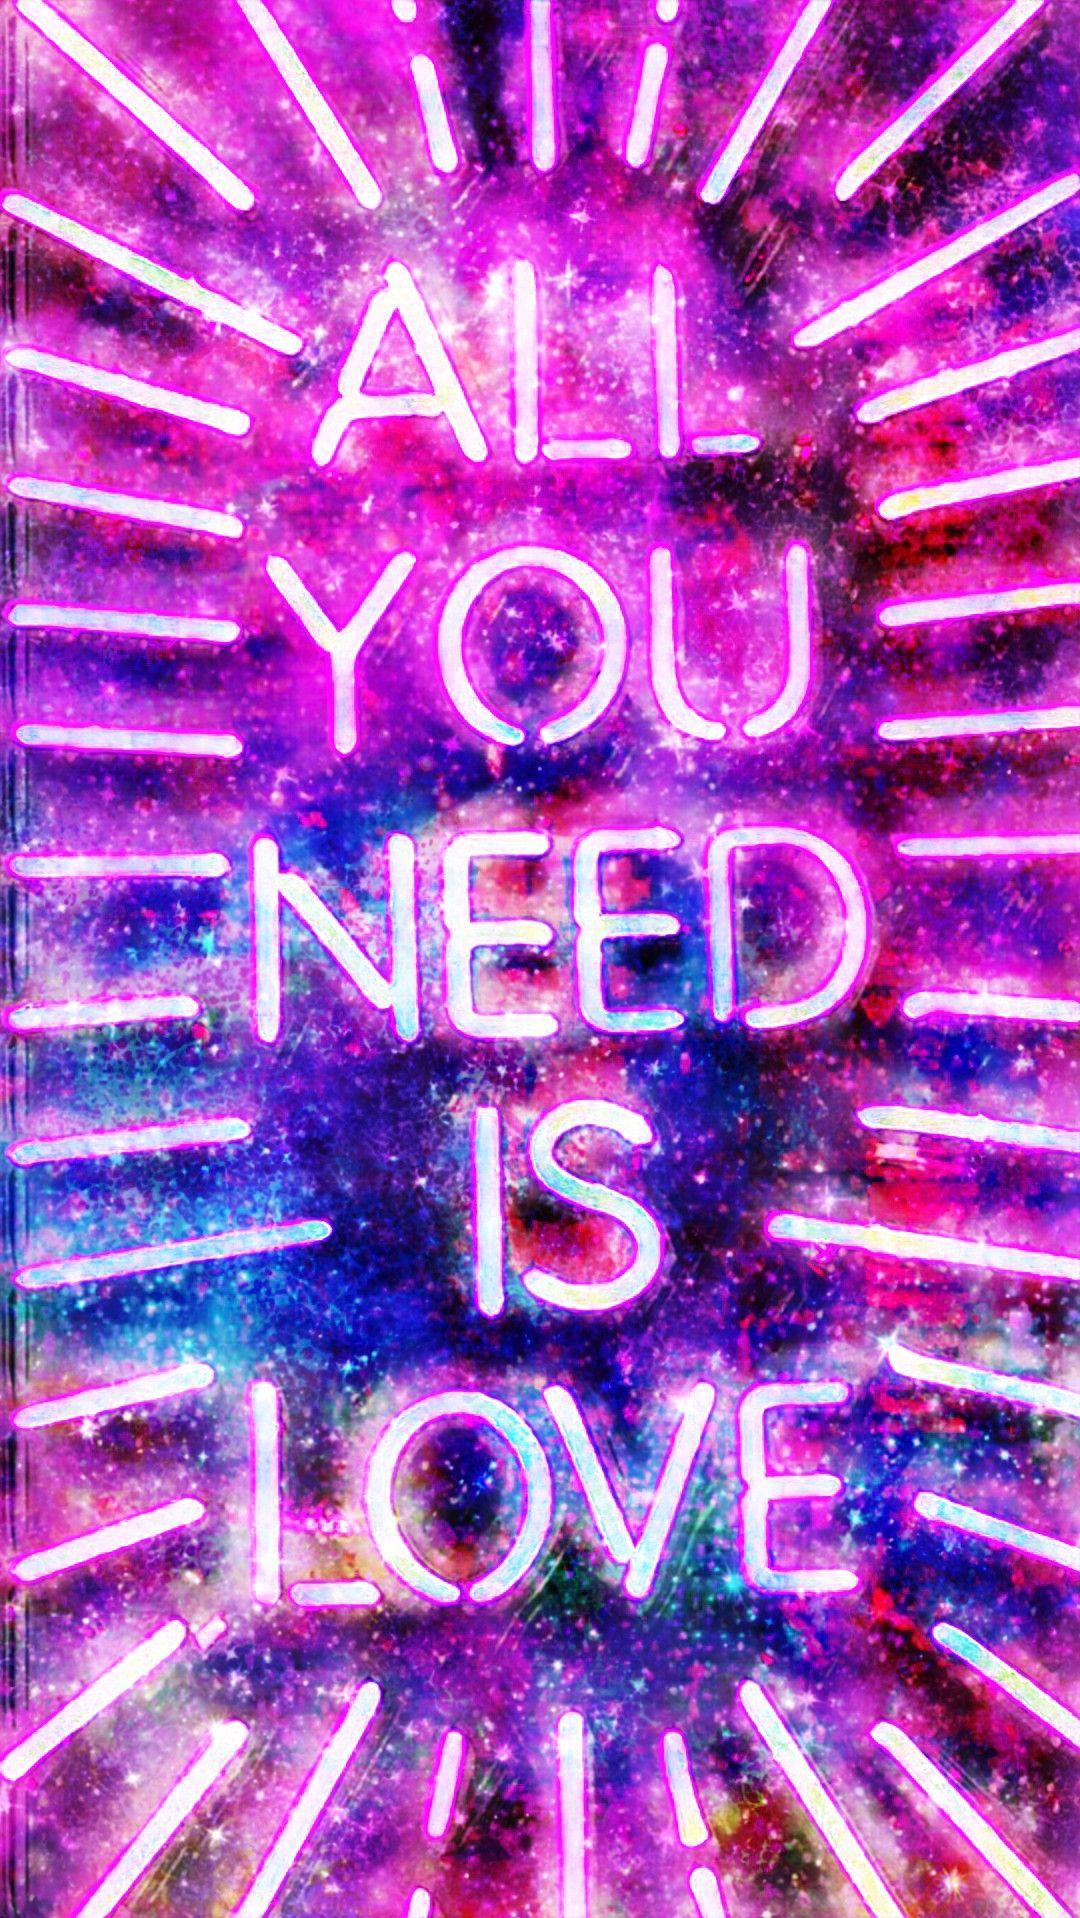 4 44217 rainbow neon galaxy background